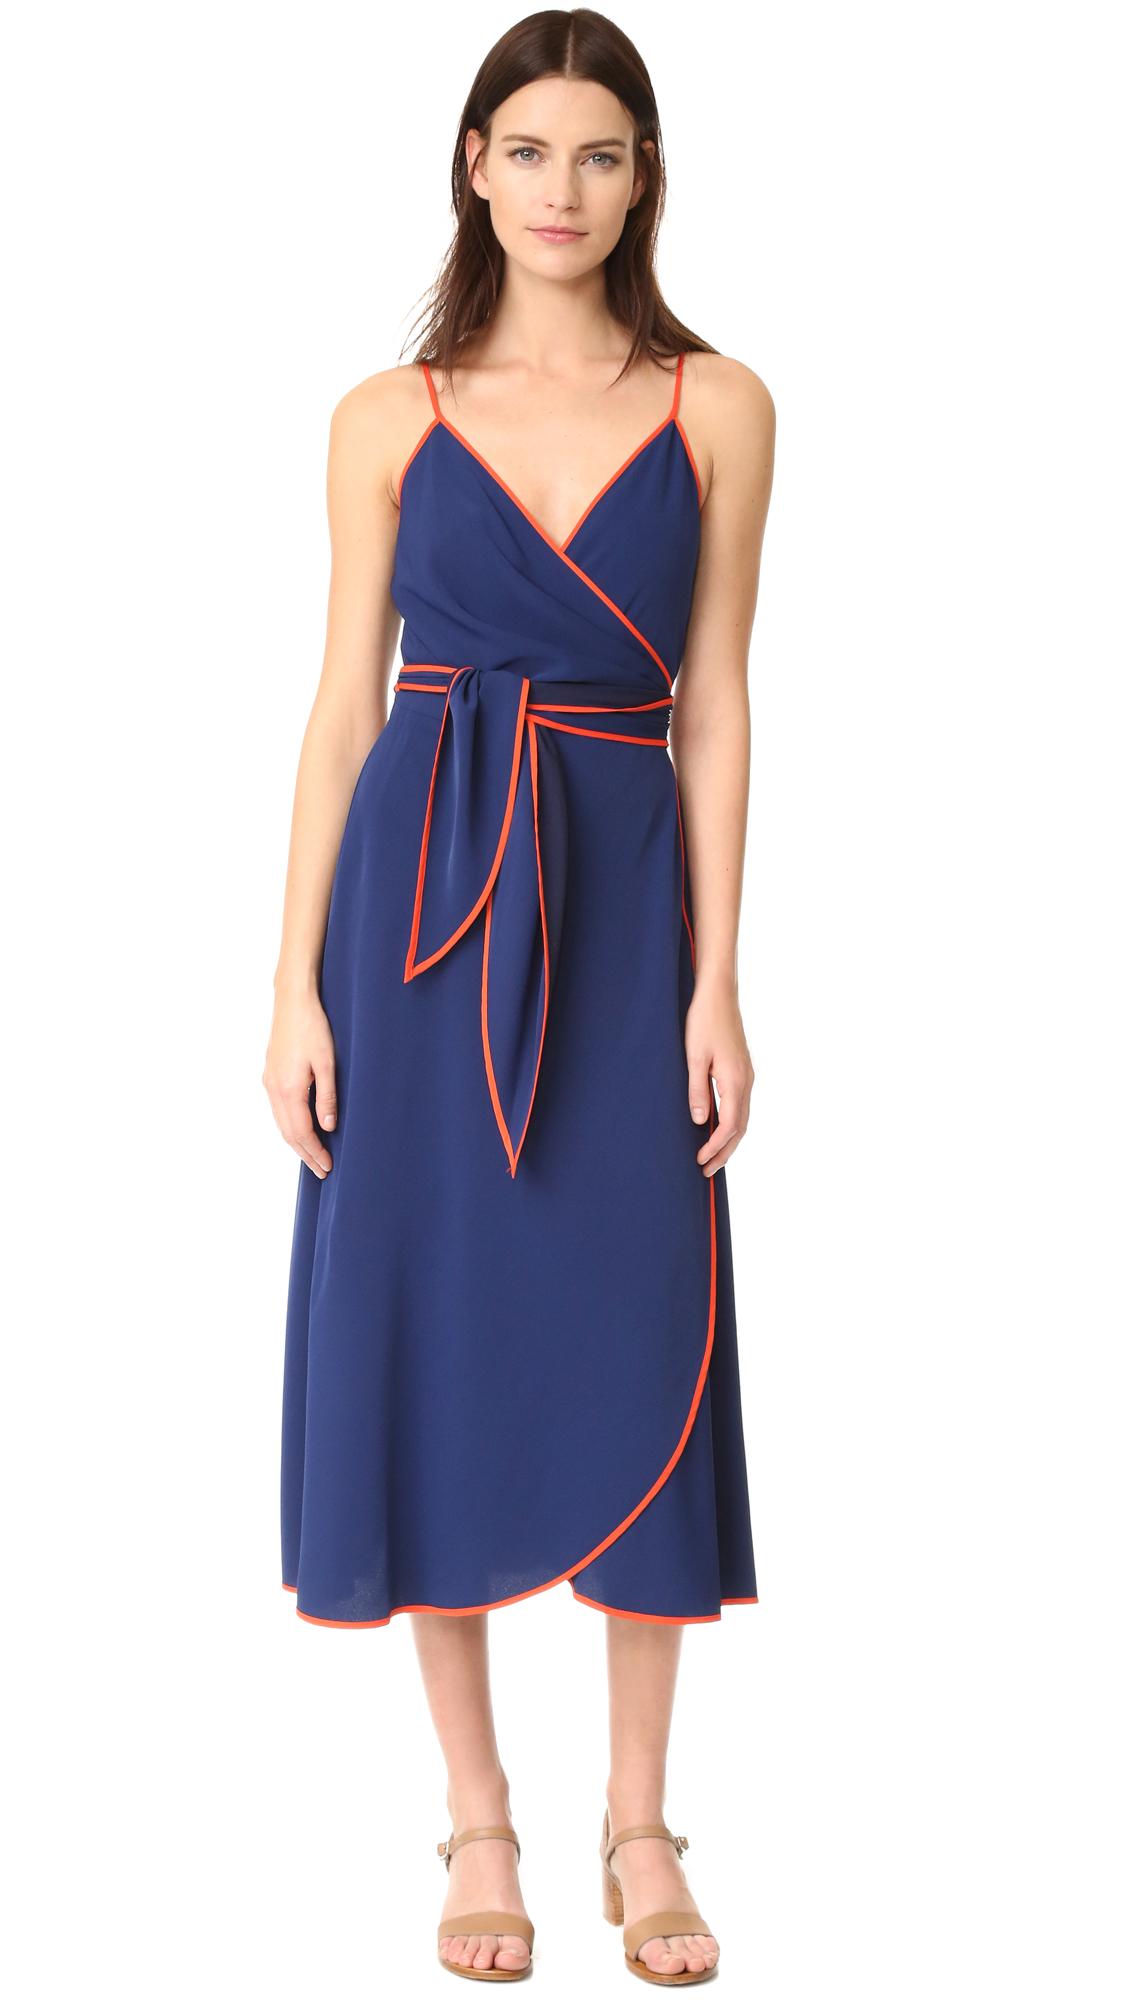 Tory Burch Grotto Wrap Dress - Navy Sea